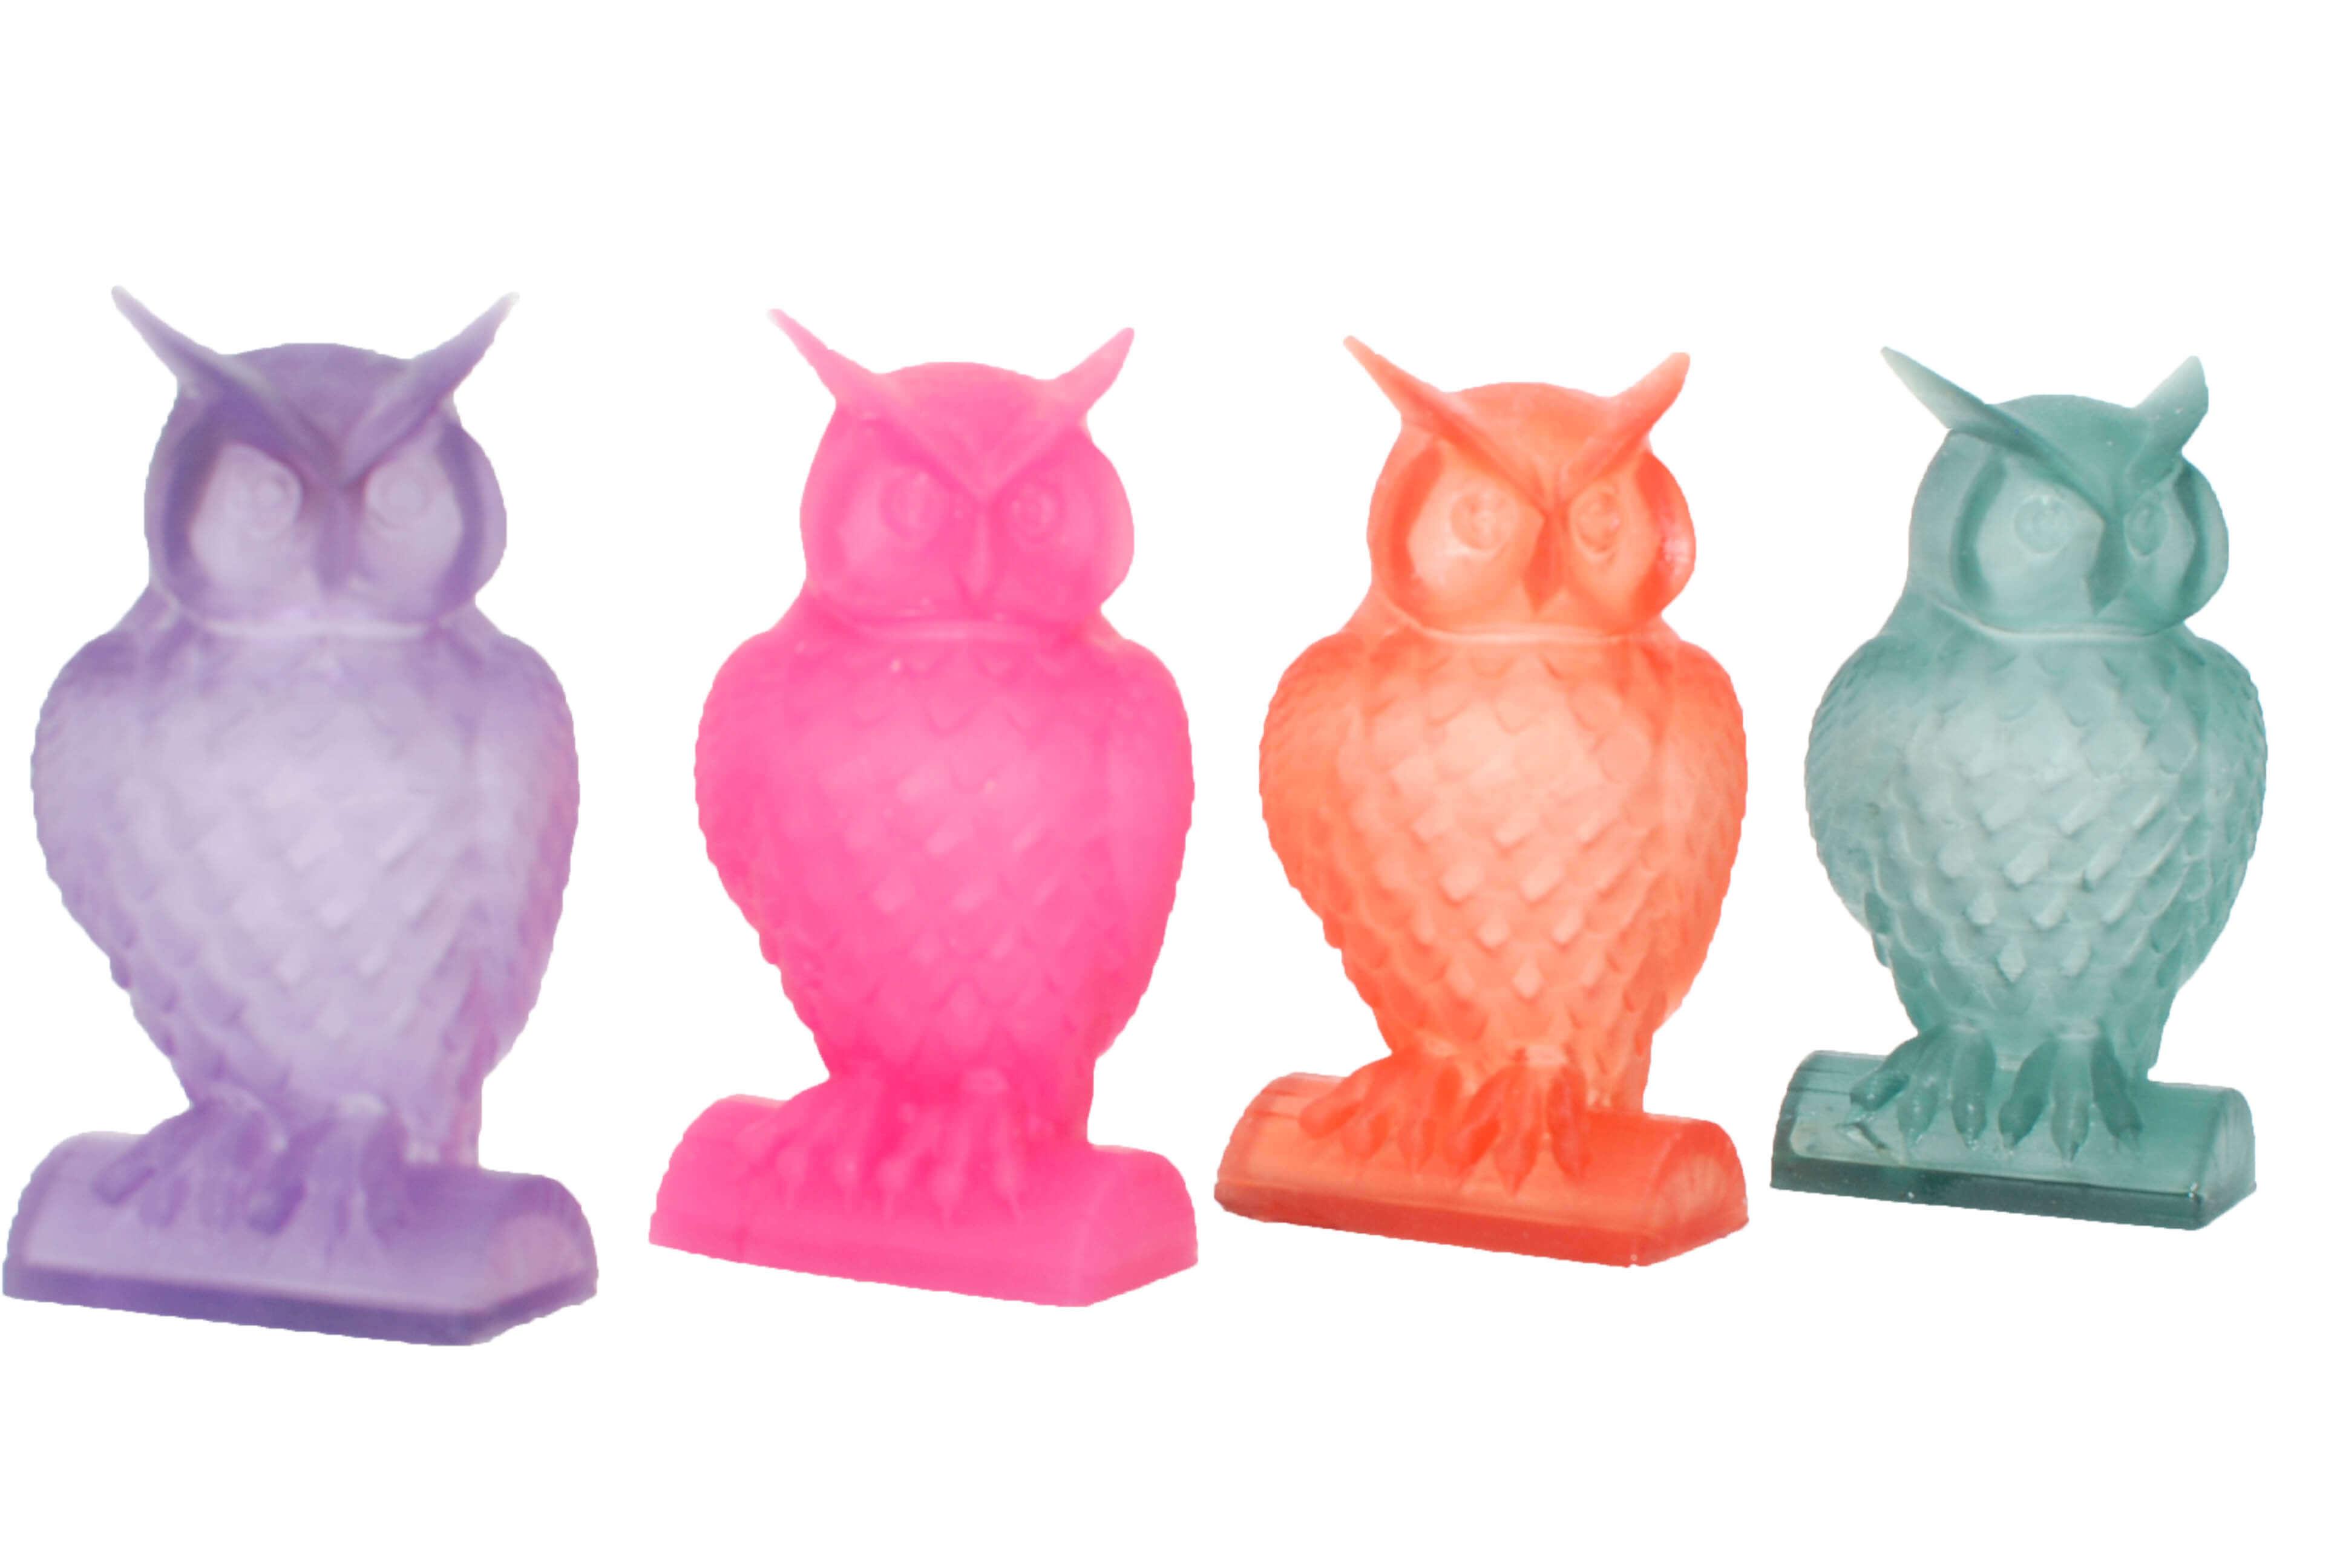 WorkshopSLA 3D PrinterDIY